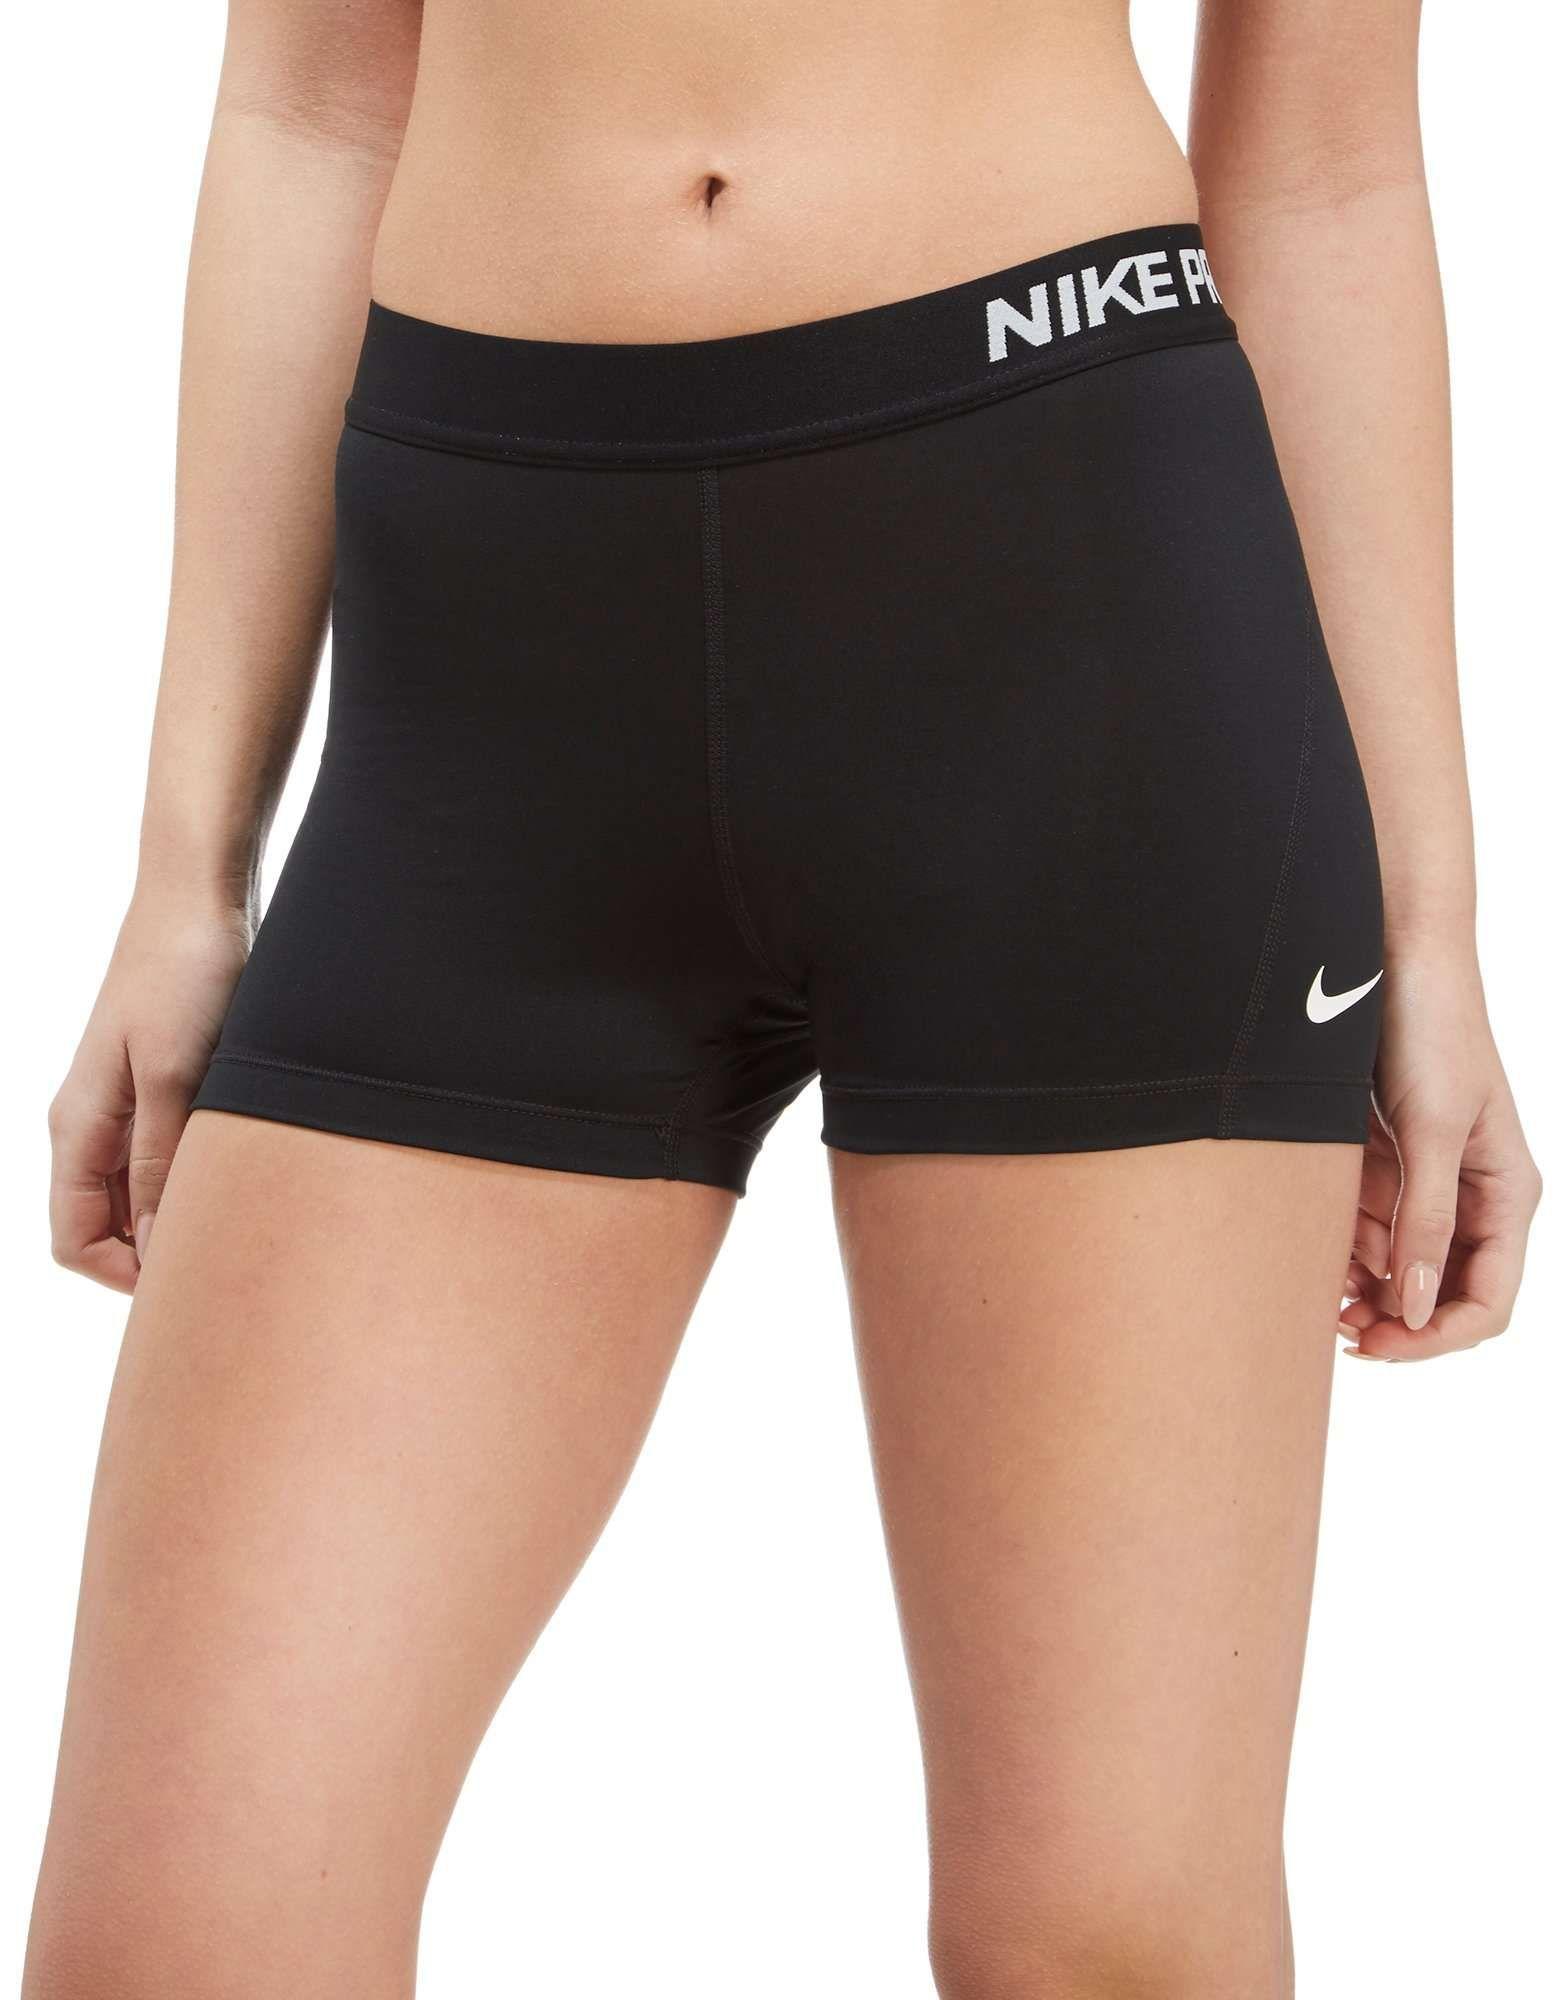 "Nike Pro 3"" Shorts JD Sports Gym shorts womens, Gym"